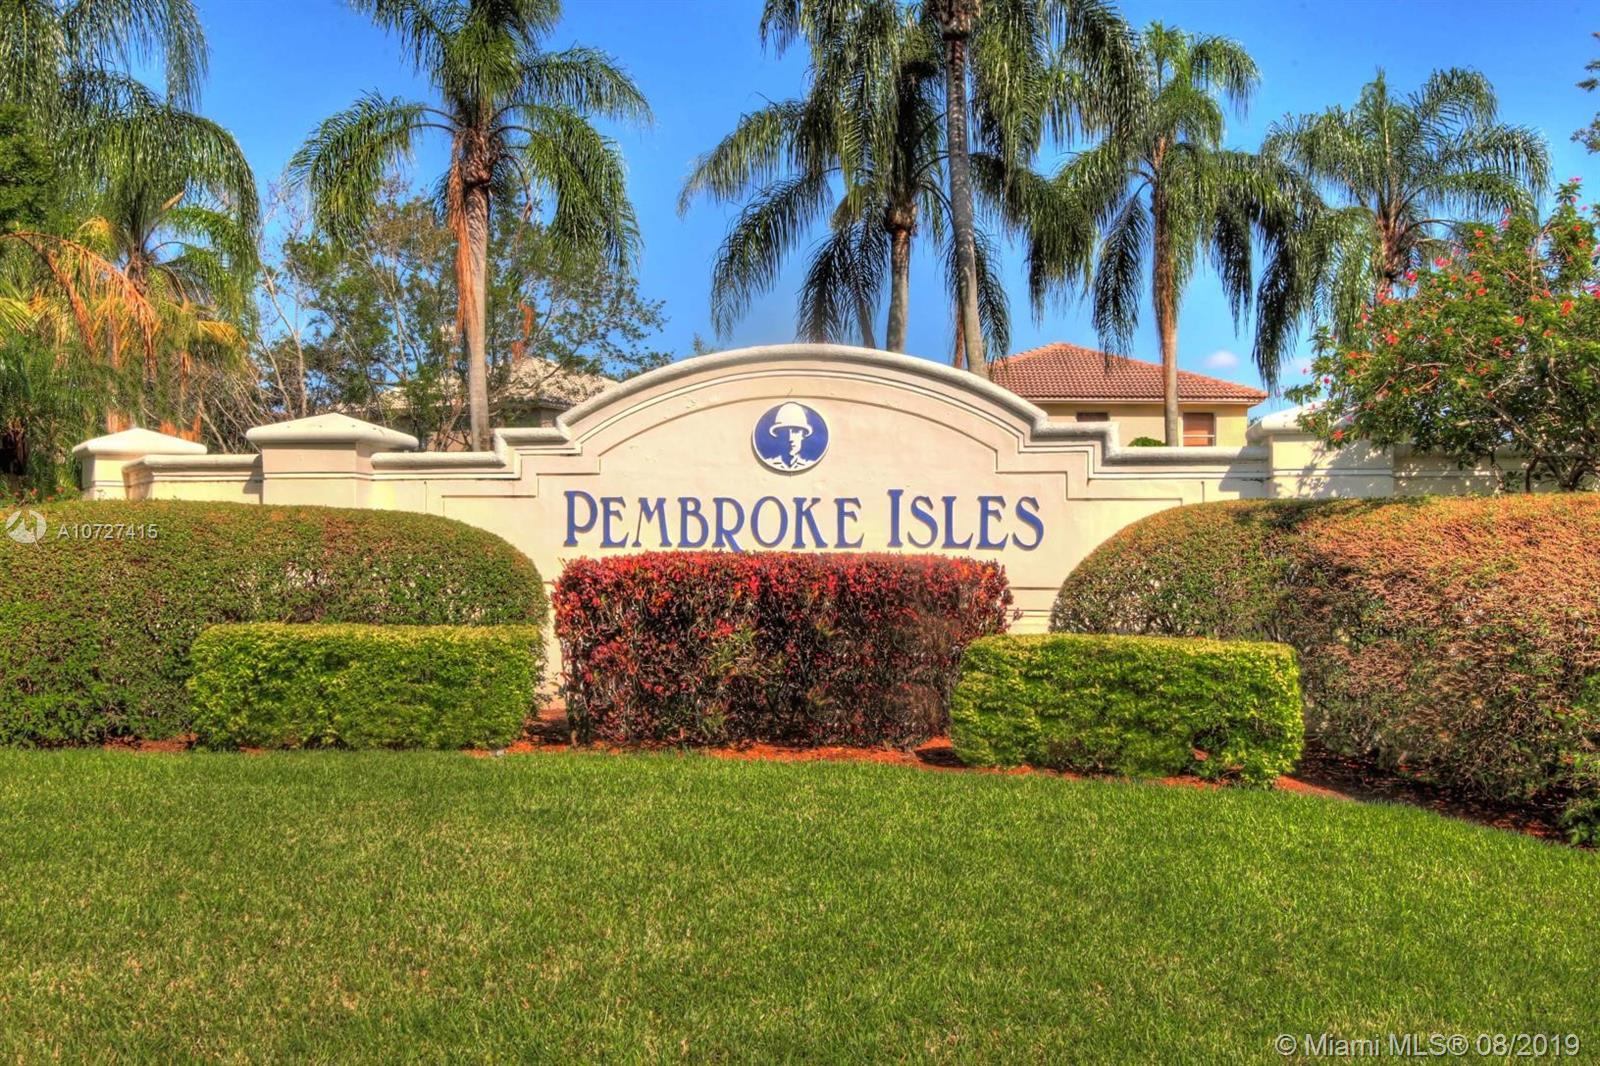 Pembroke Isles # - 35 - photo